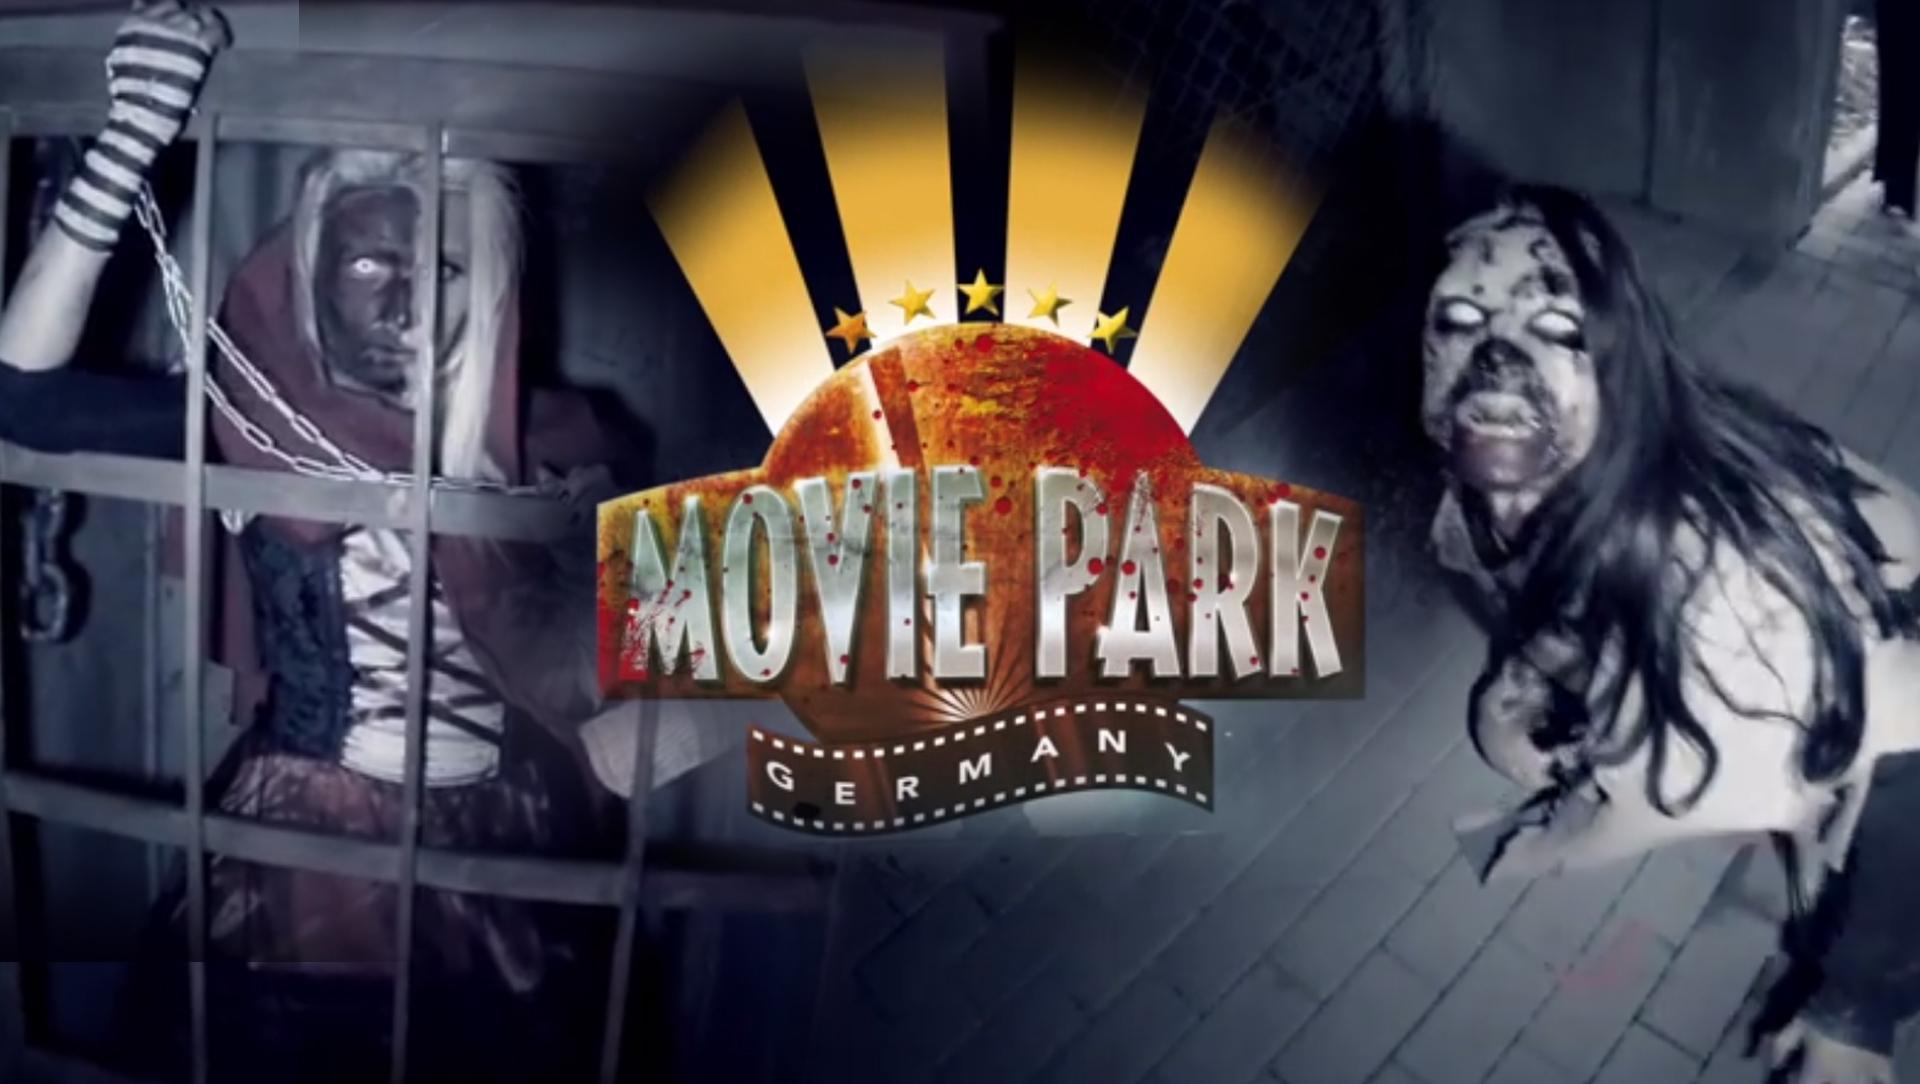 Halloween Horror Fest im Movie Park(Bottrop) 08.10.2016 26% Rabatt = 7,50€